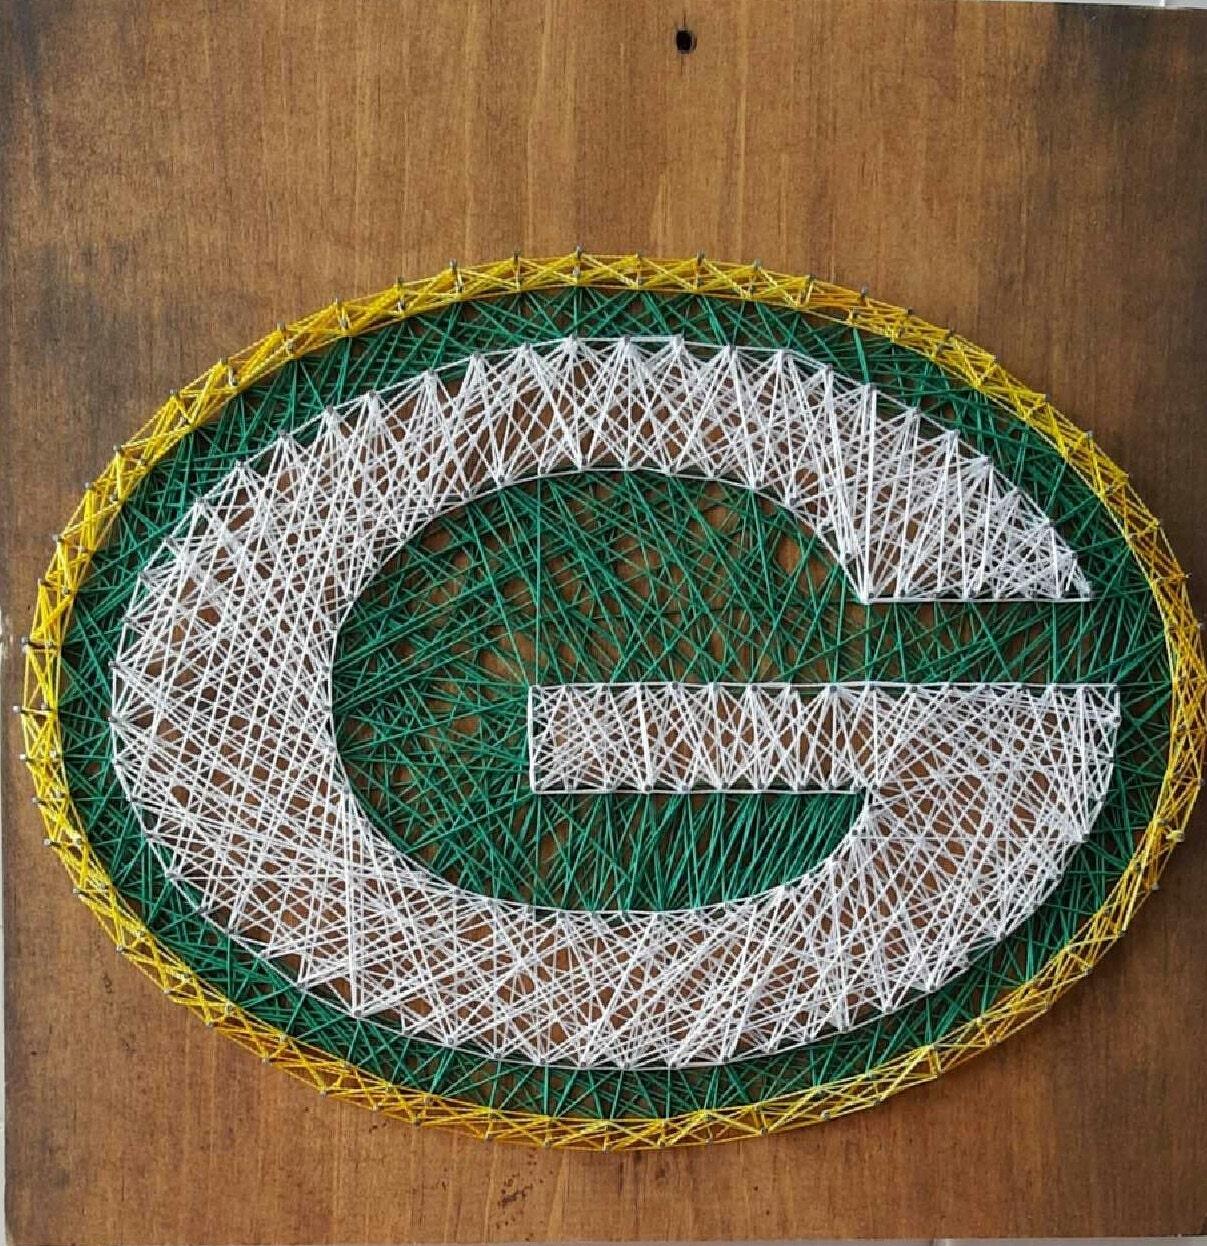 Green Bay Packer String Art